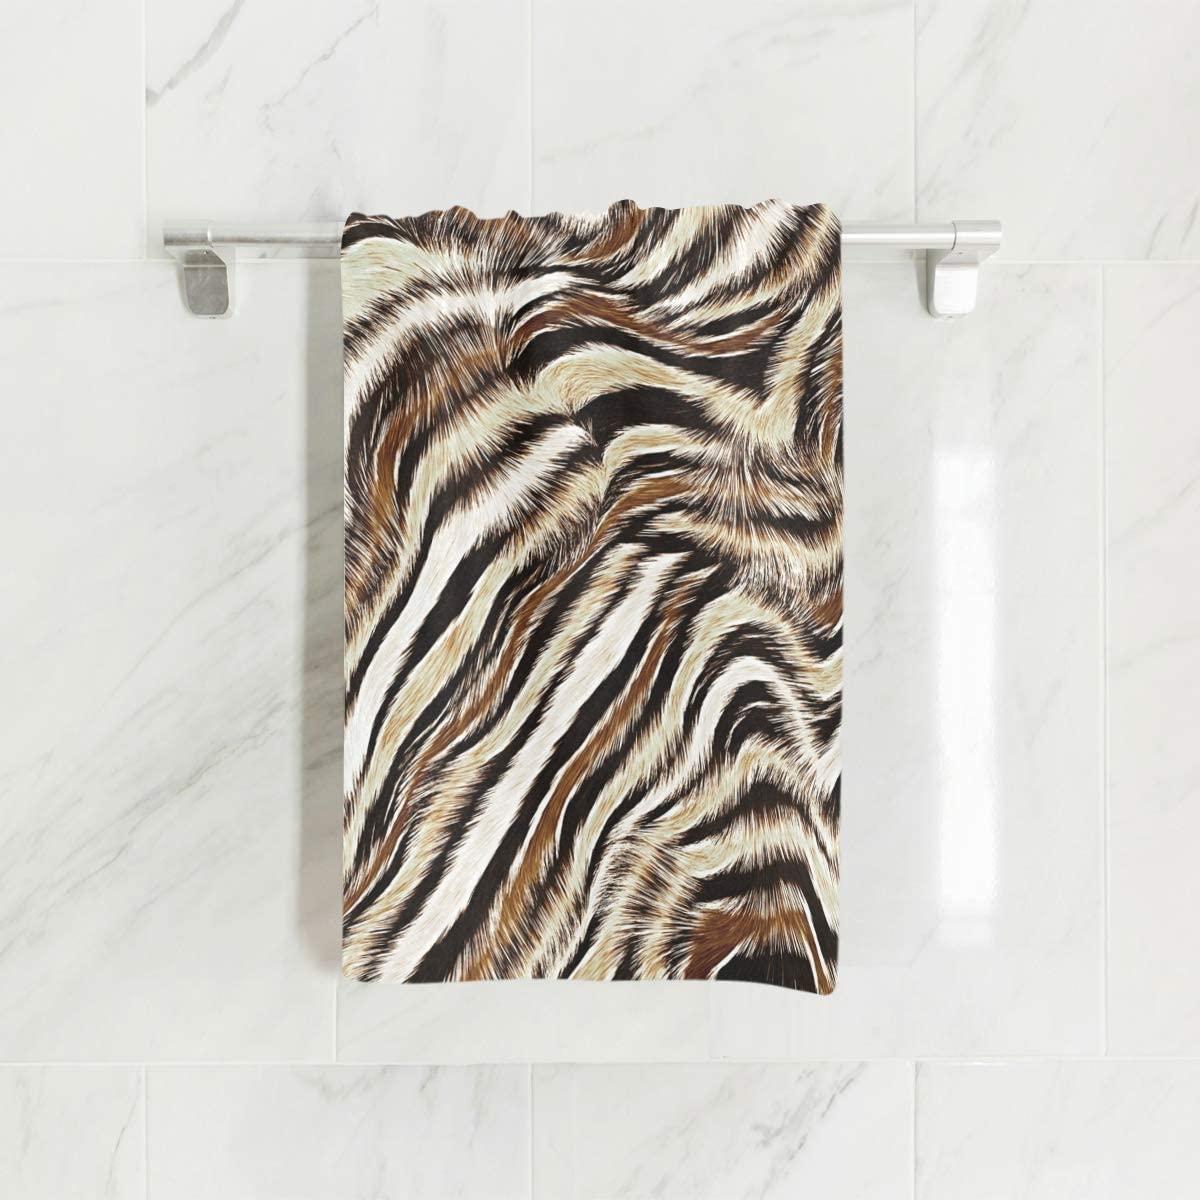 senya Towels, Leopard Animal Print Soft Hand Towel for Bathroom, Kitchen, Hotel spa